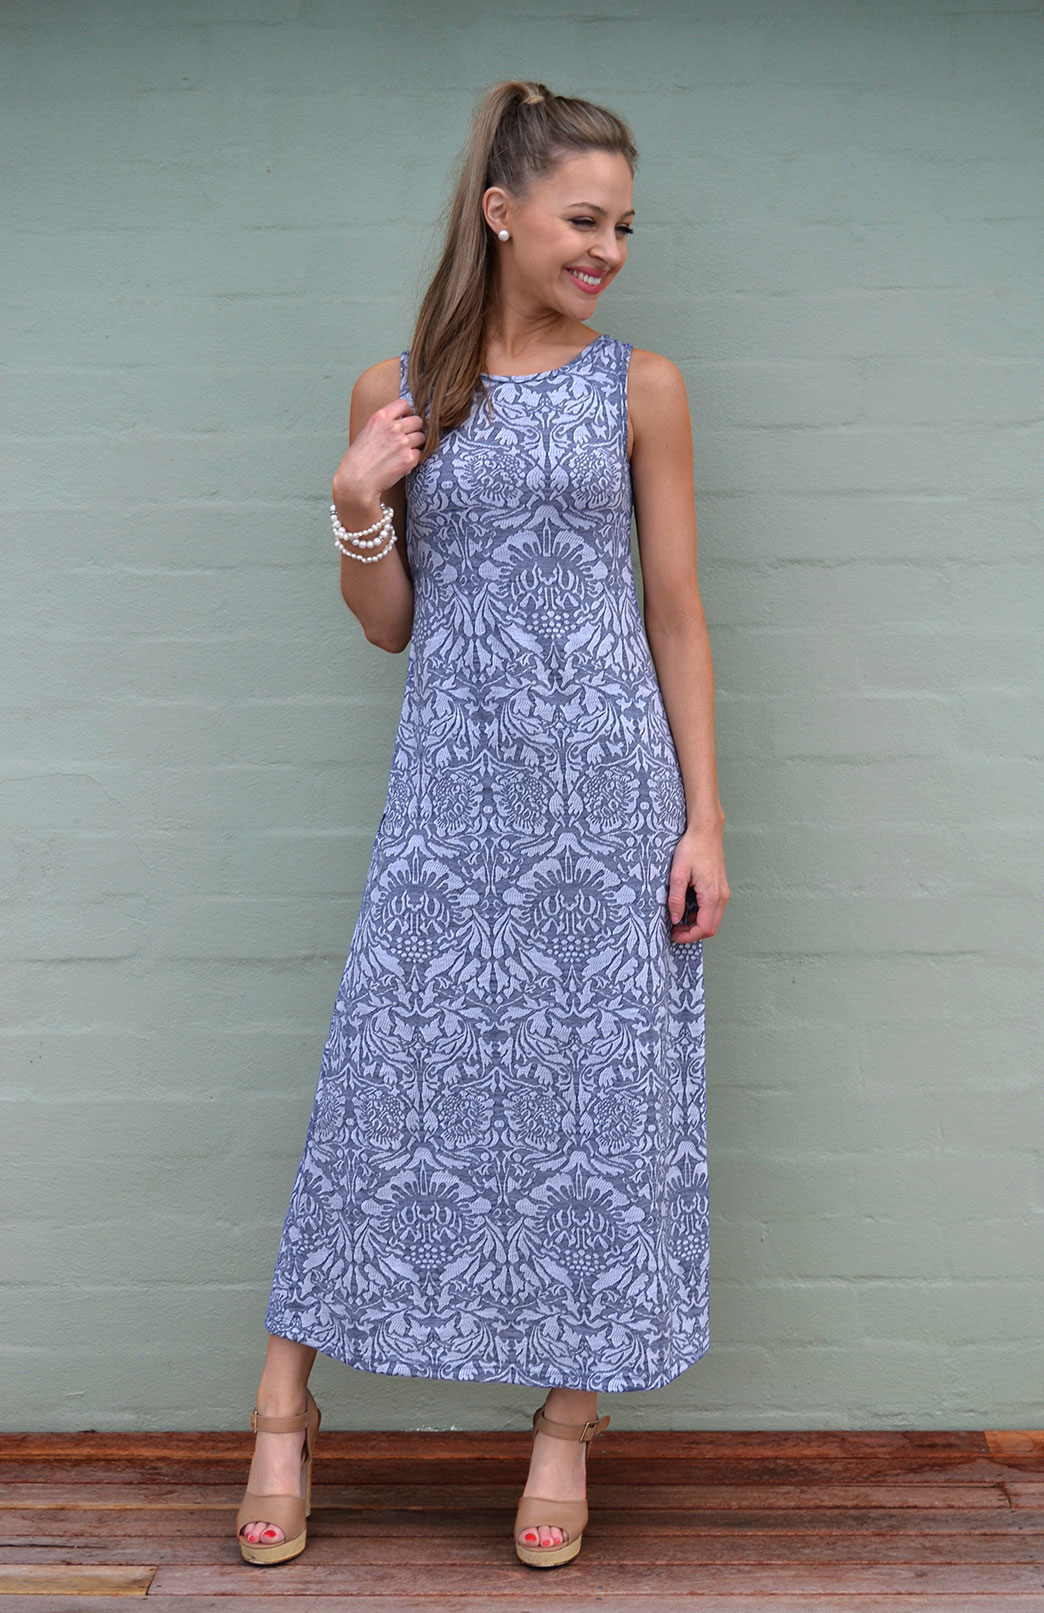 bba20e74c7ec Boat Neck Maxi Dress - Pattern - Women s Blue   Grey Floral Long Wool Maxi  Summer